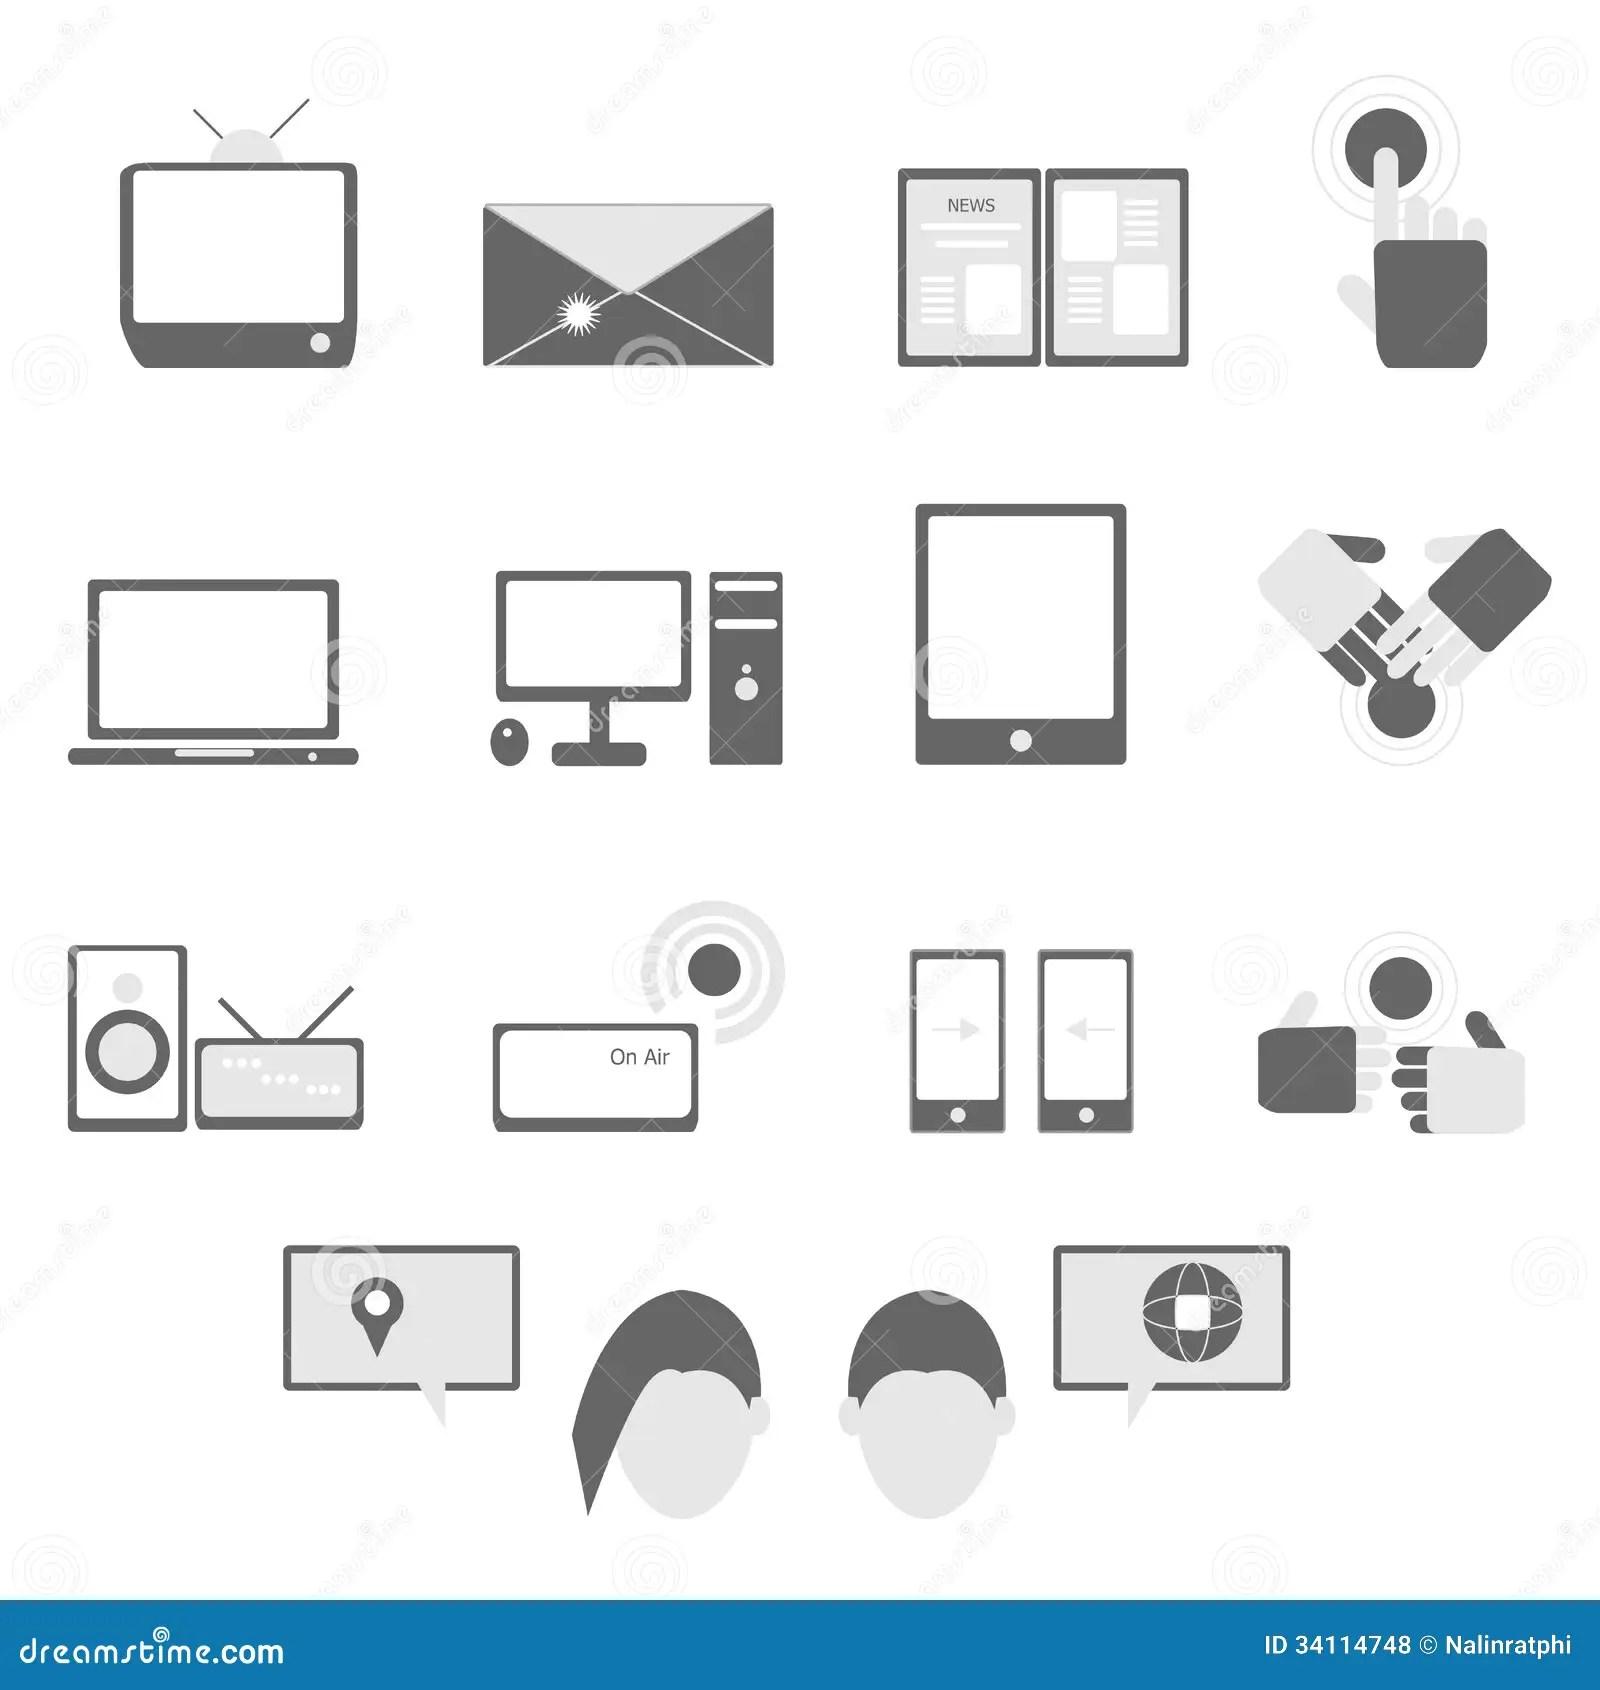 Media And Communication Icons On White Background Royalty